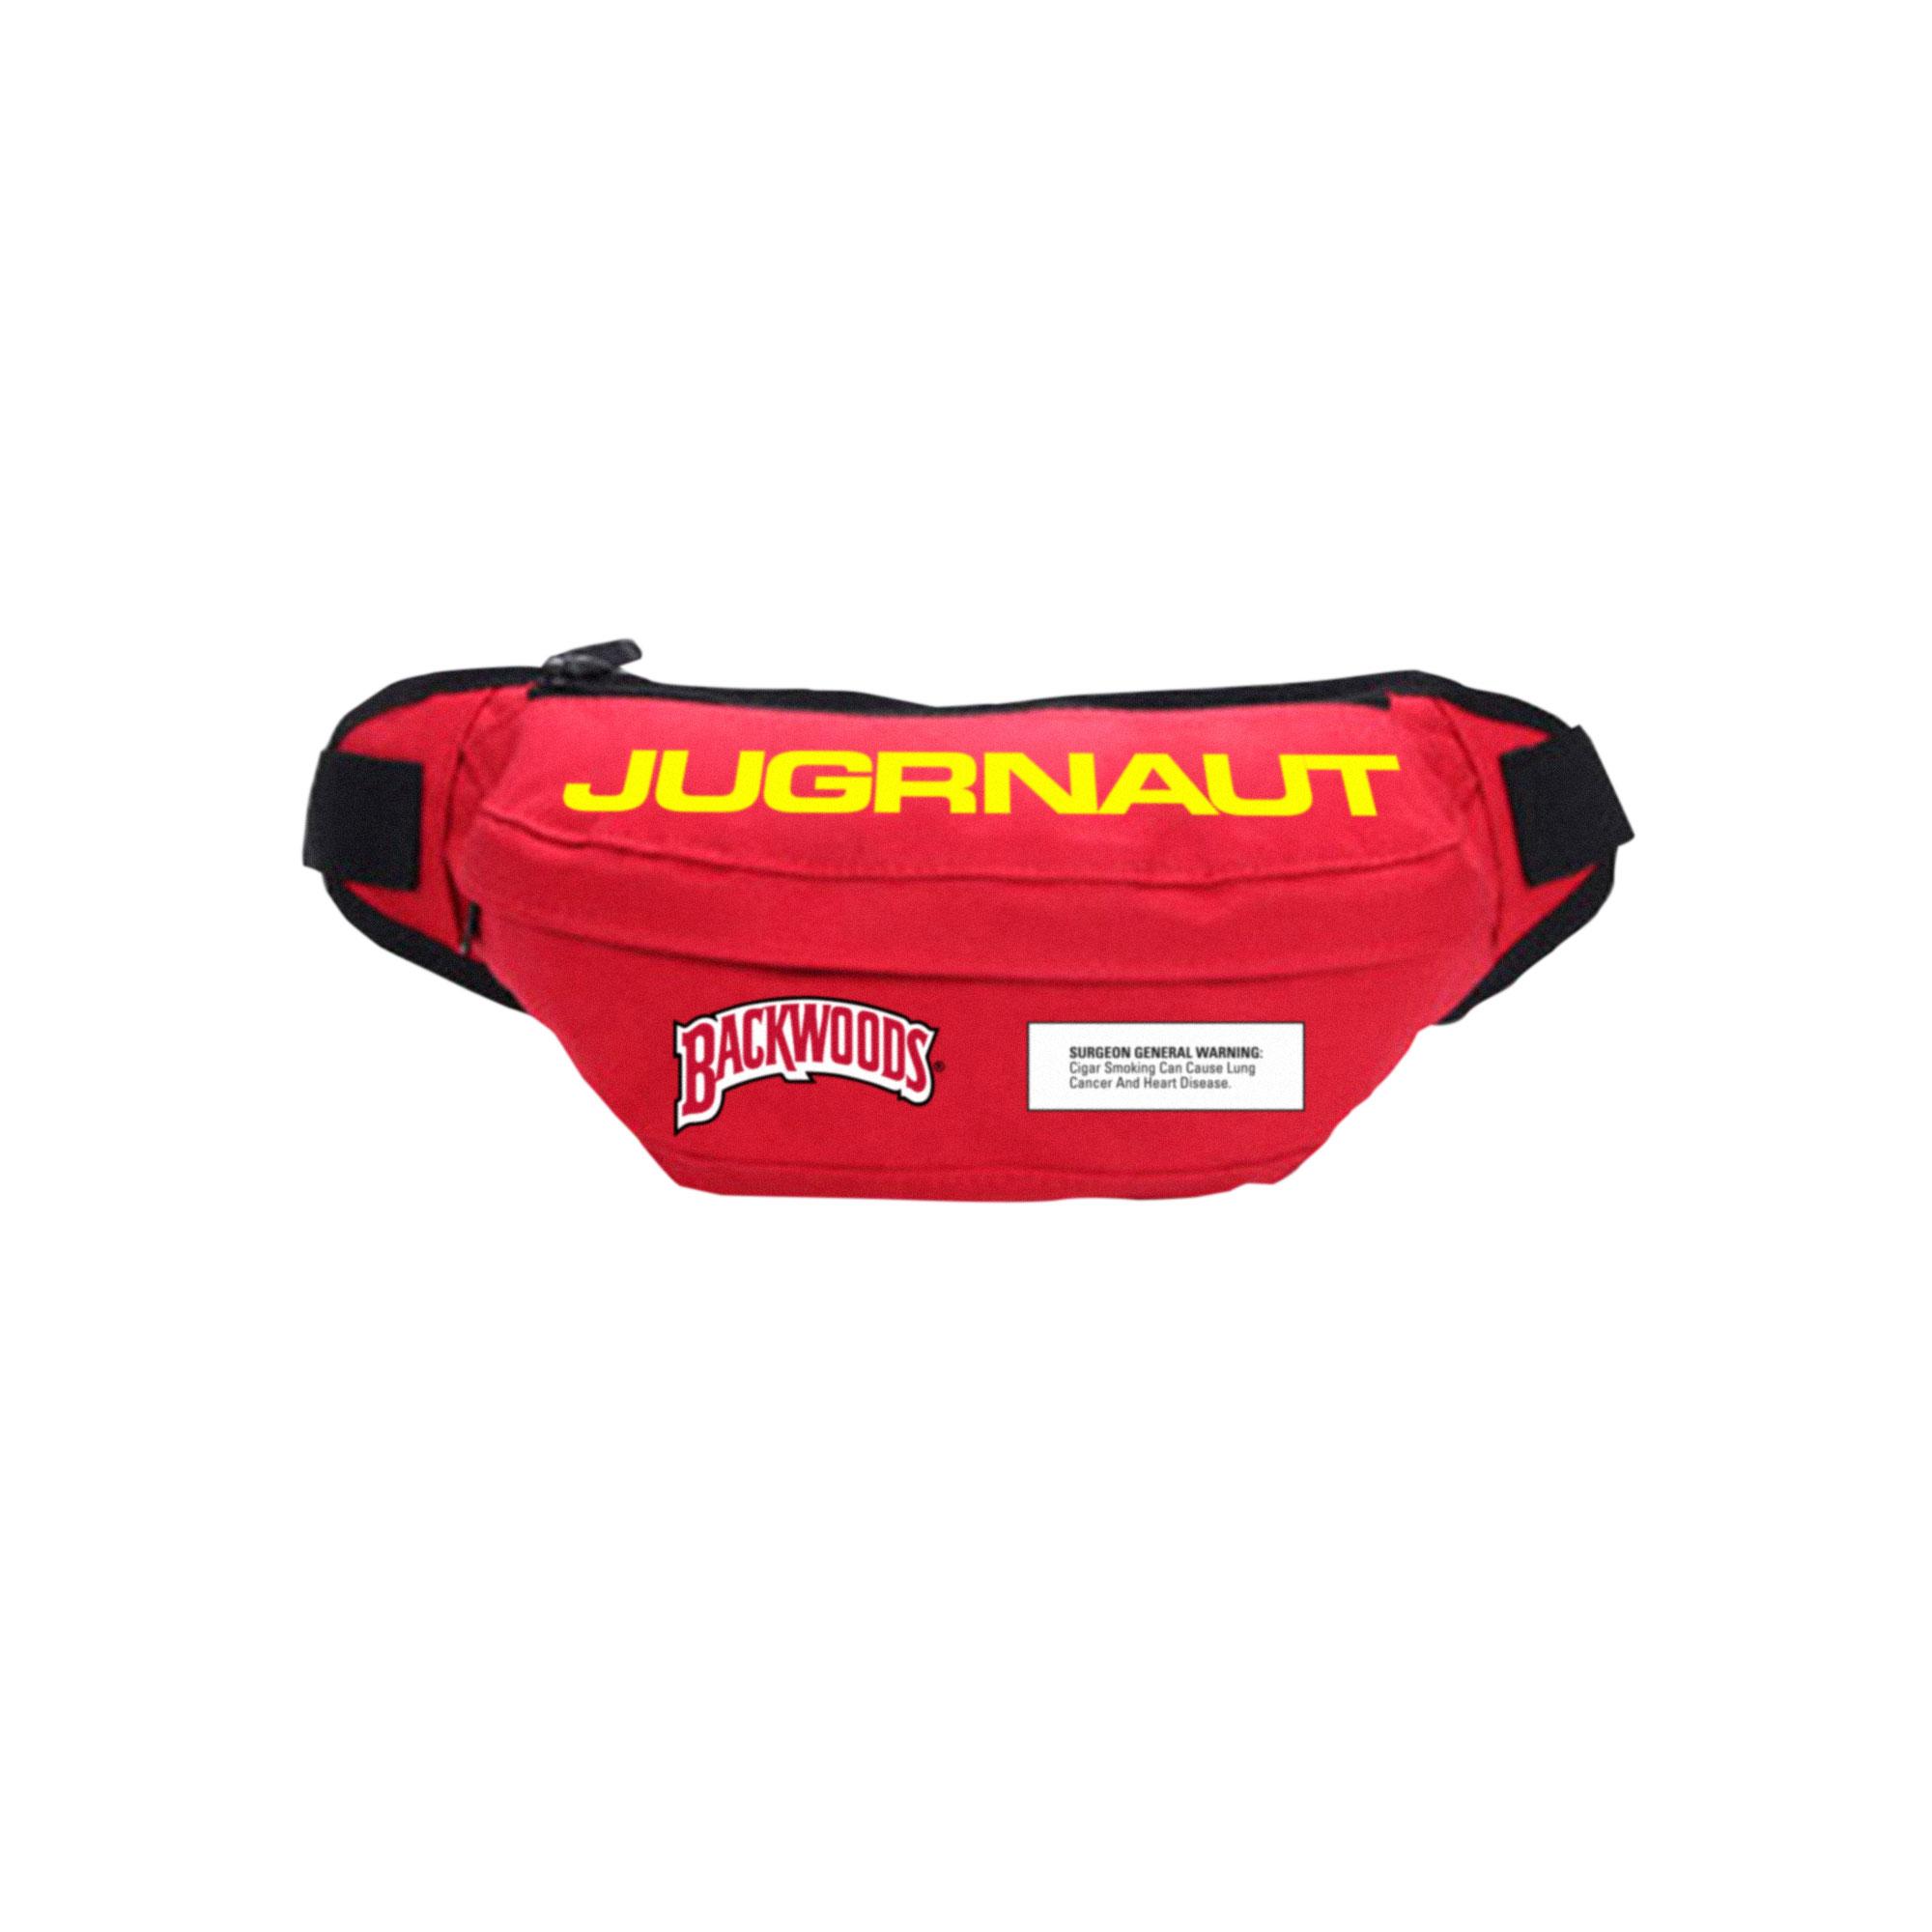 Jugrnaut-X-Backwoods-utility-fanny-waist-bag